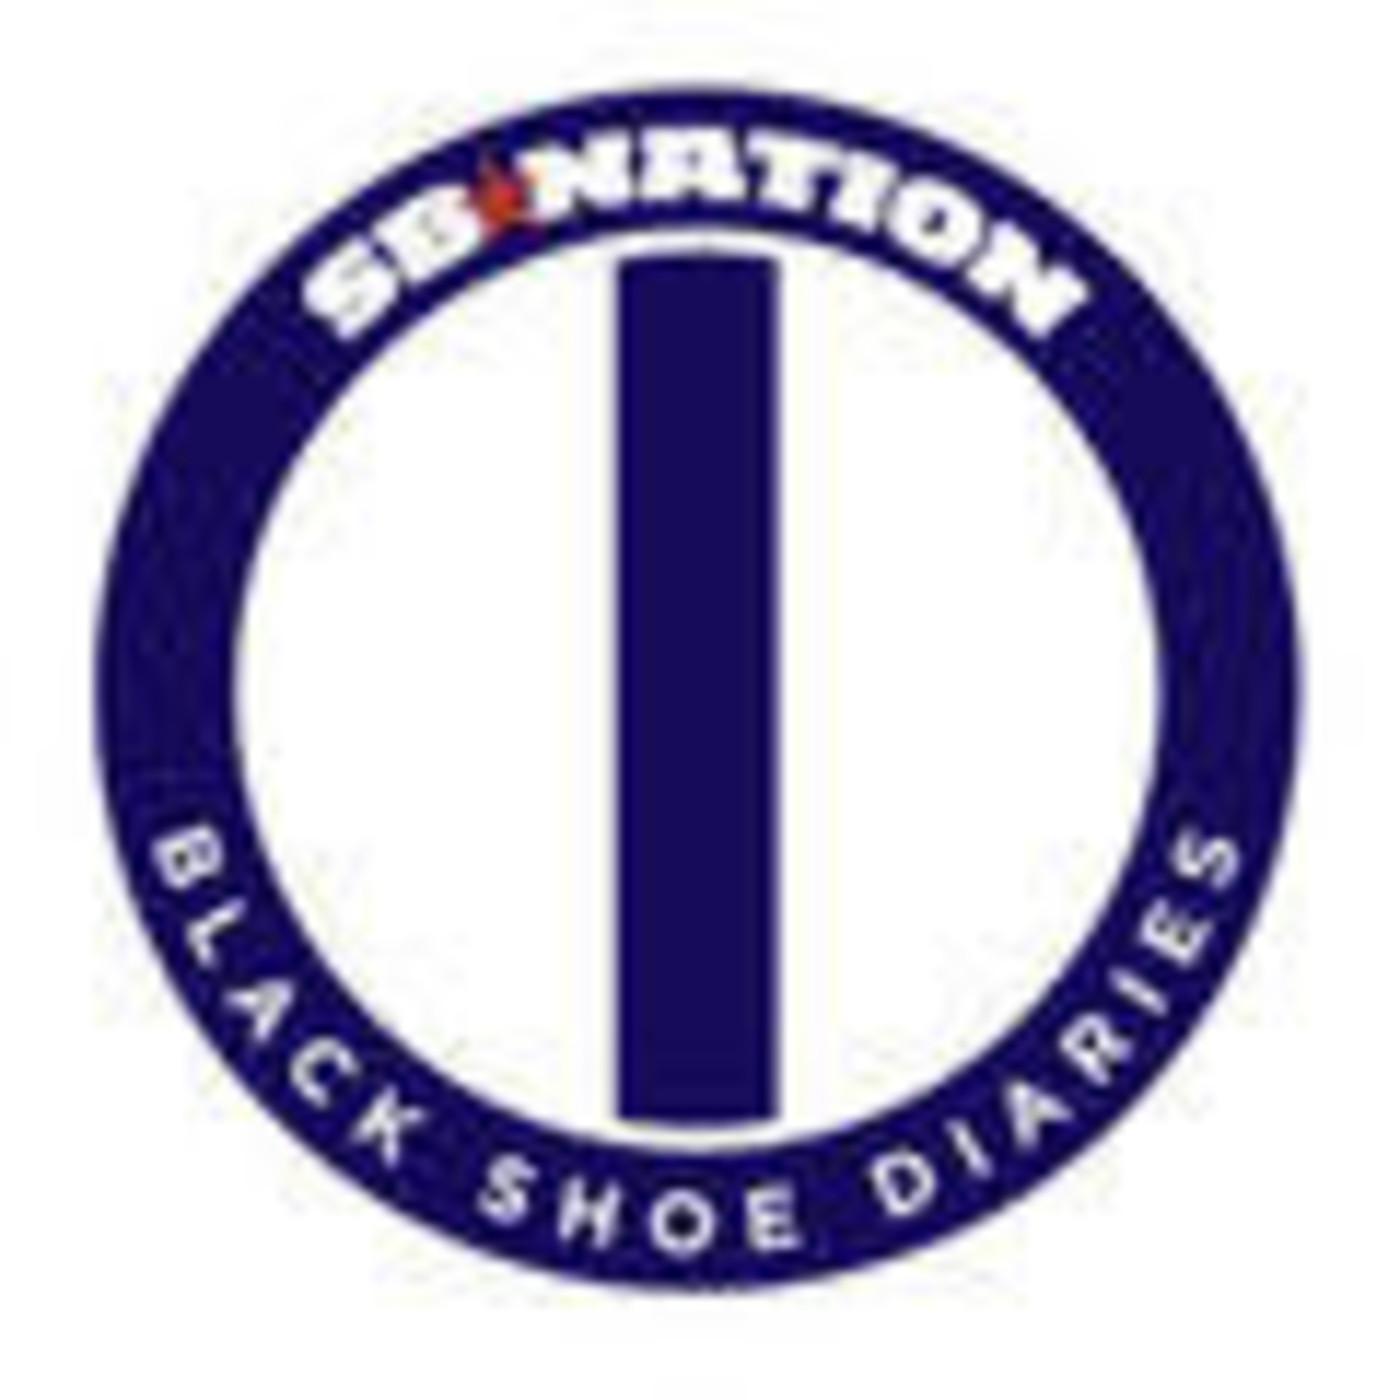 Black Shoe Podcast